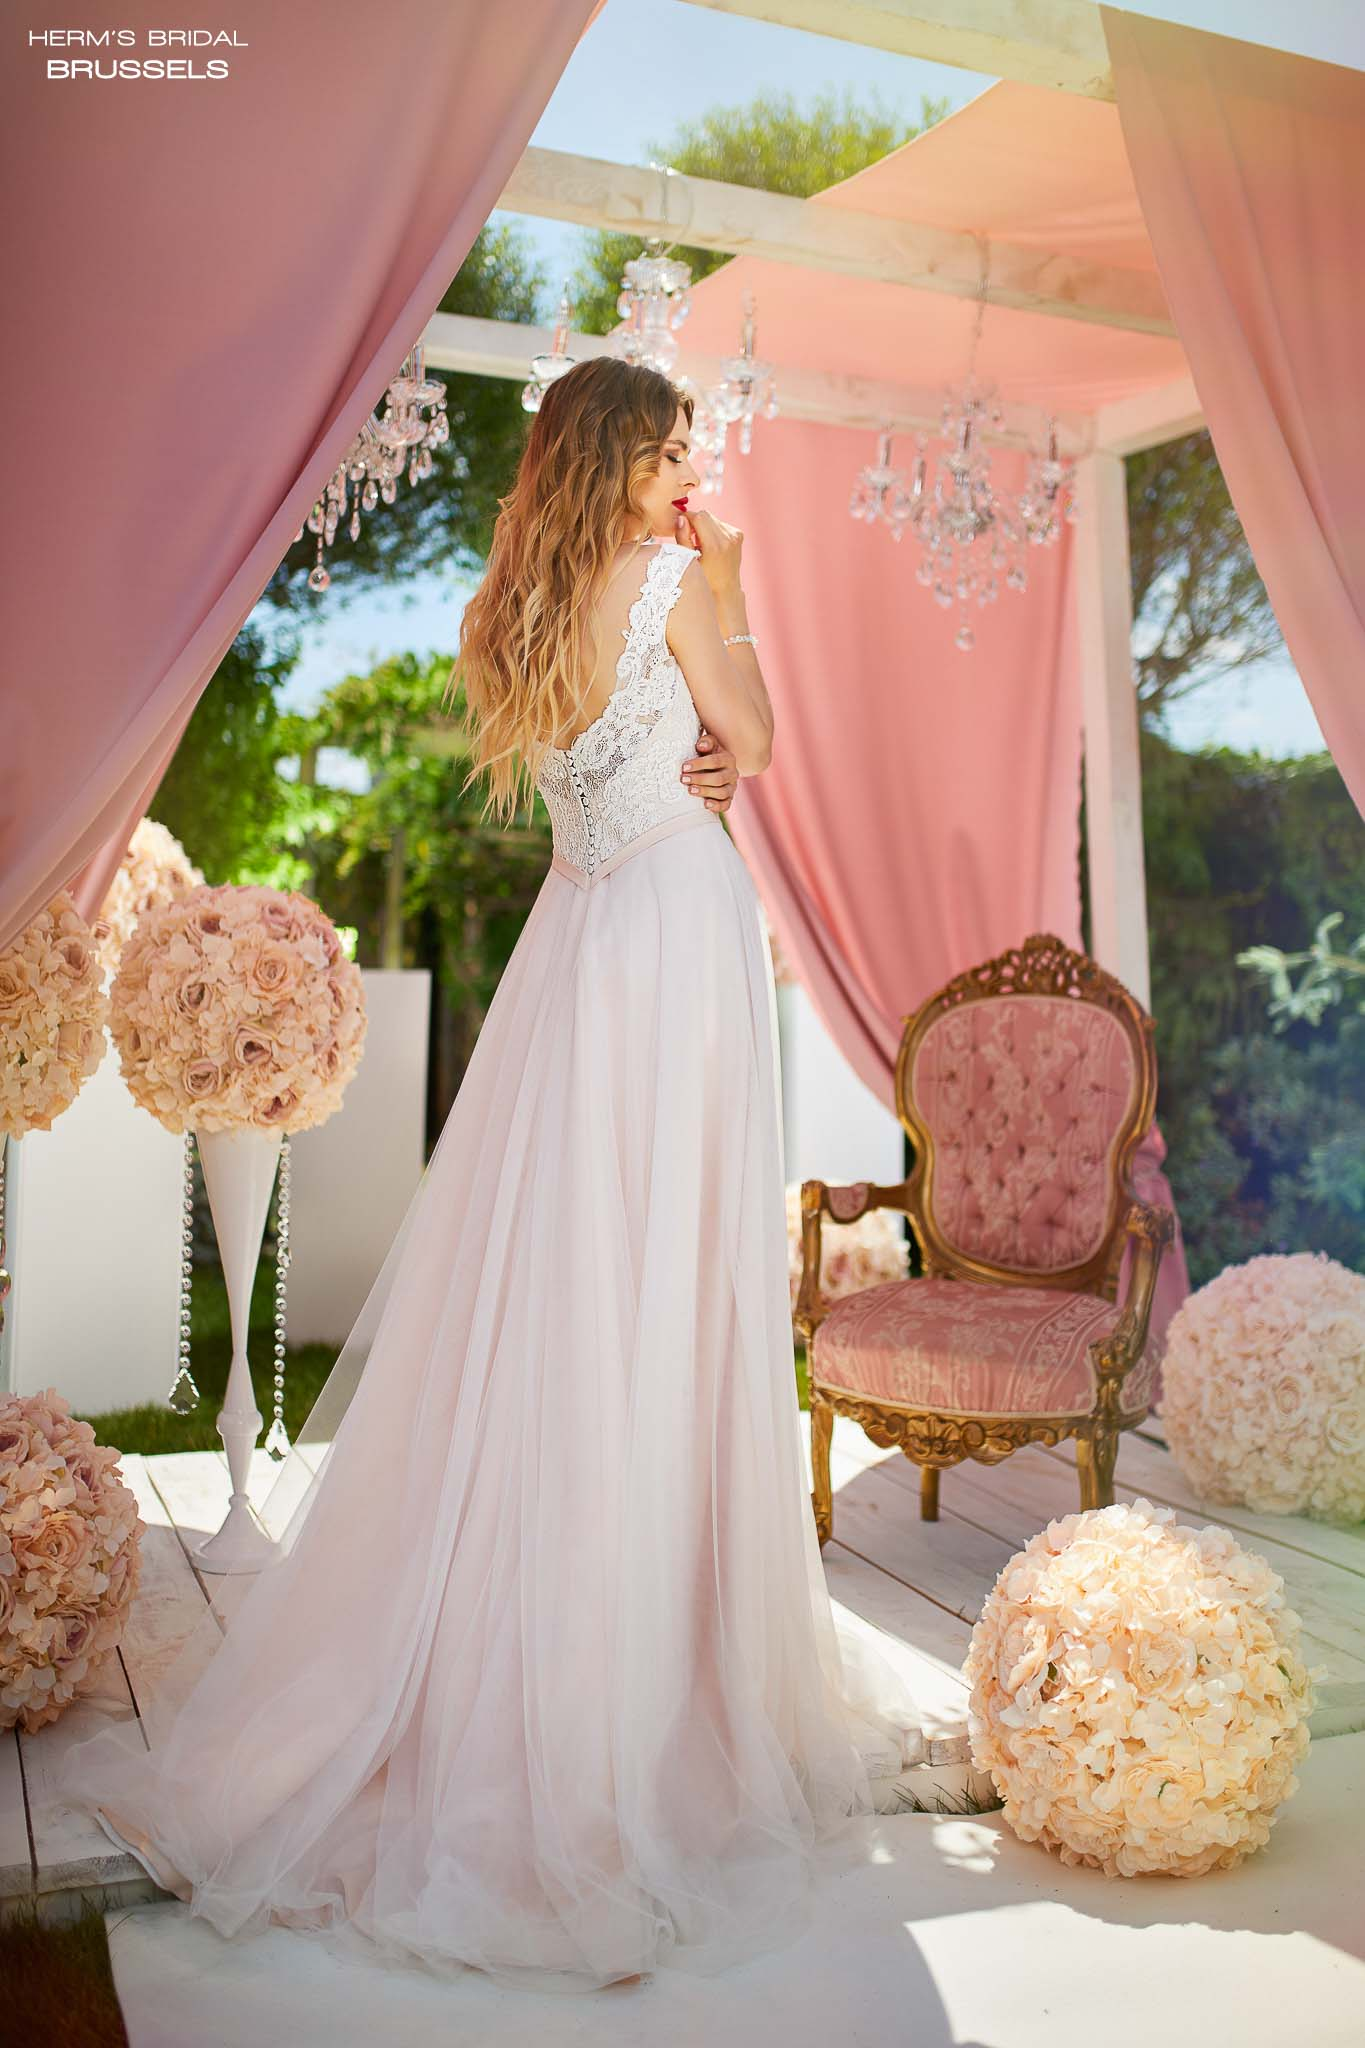 suknia ślubna Herm's Bridal Brussels